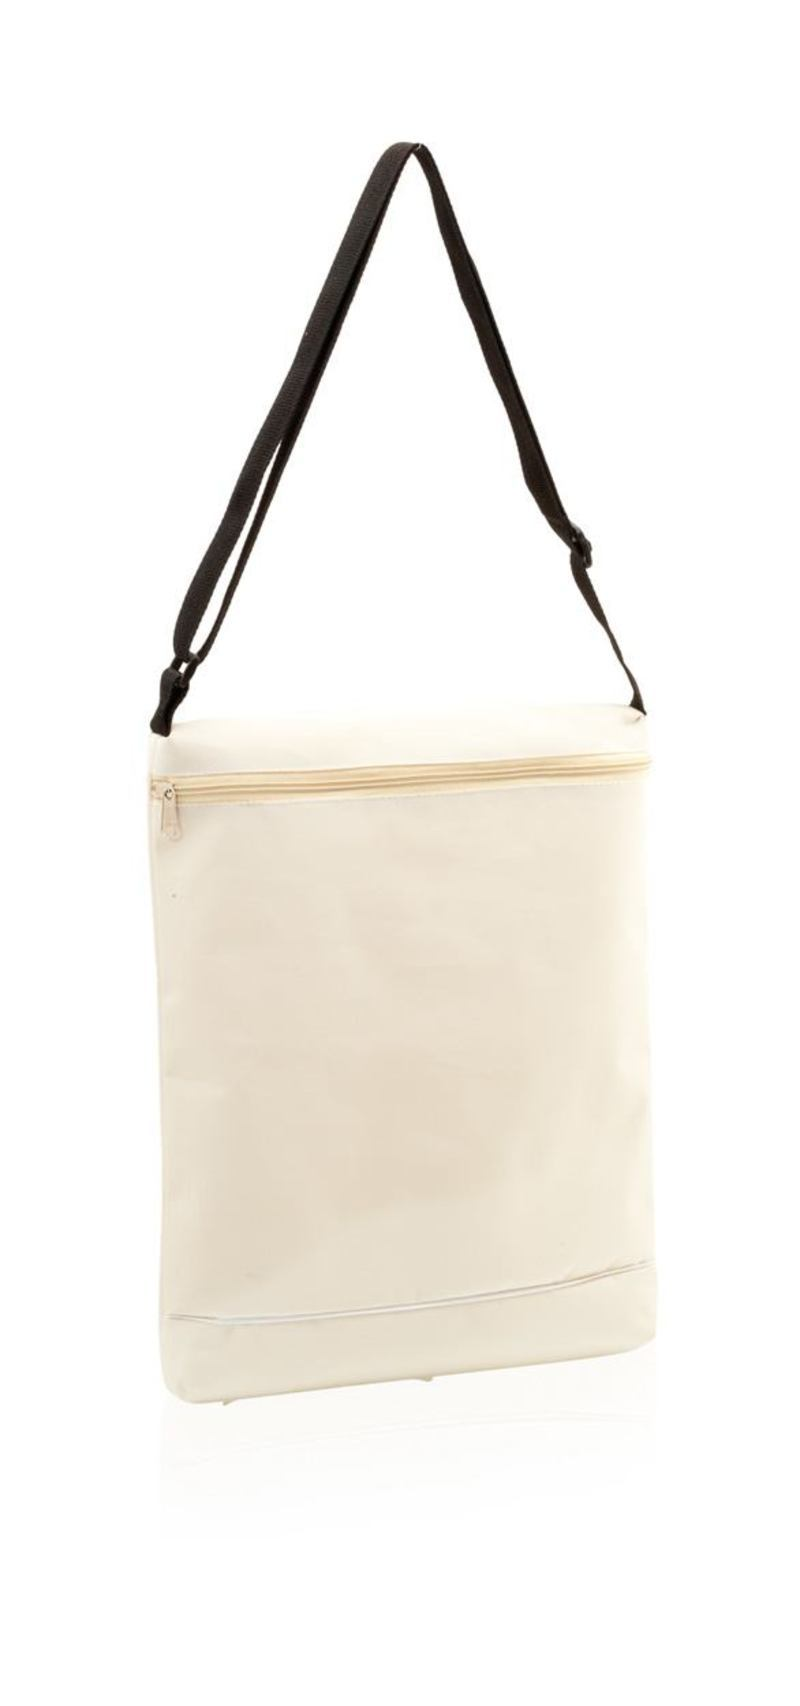 Verman document bag